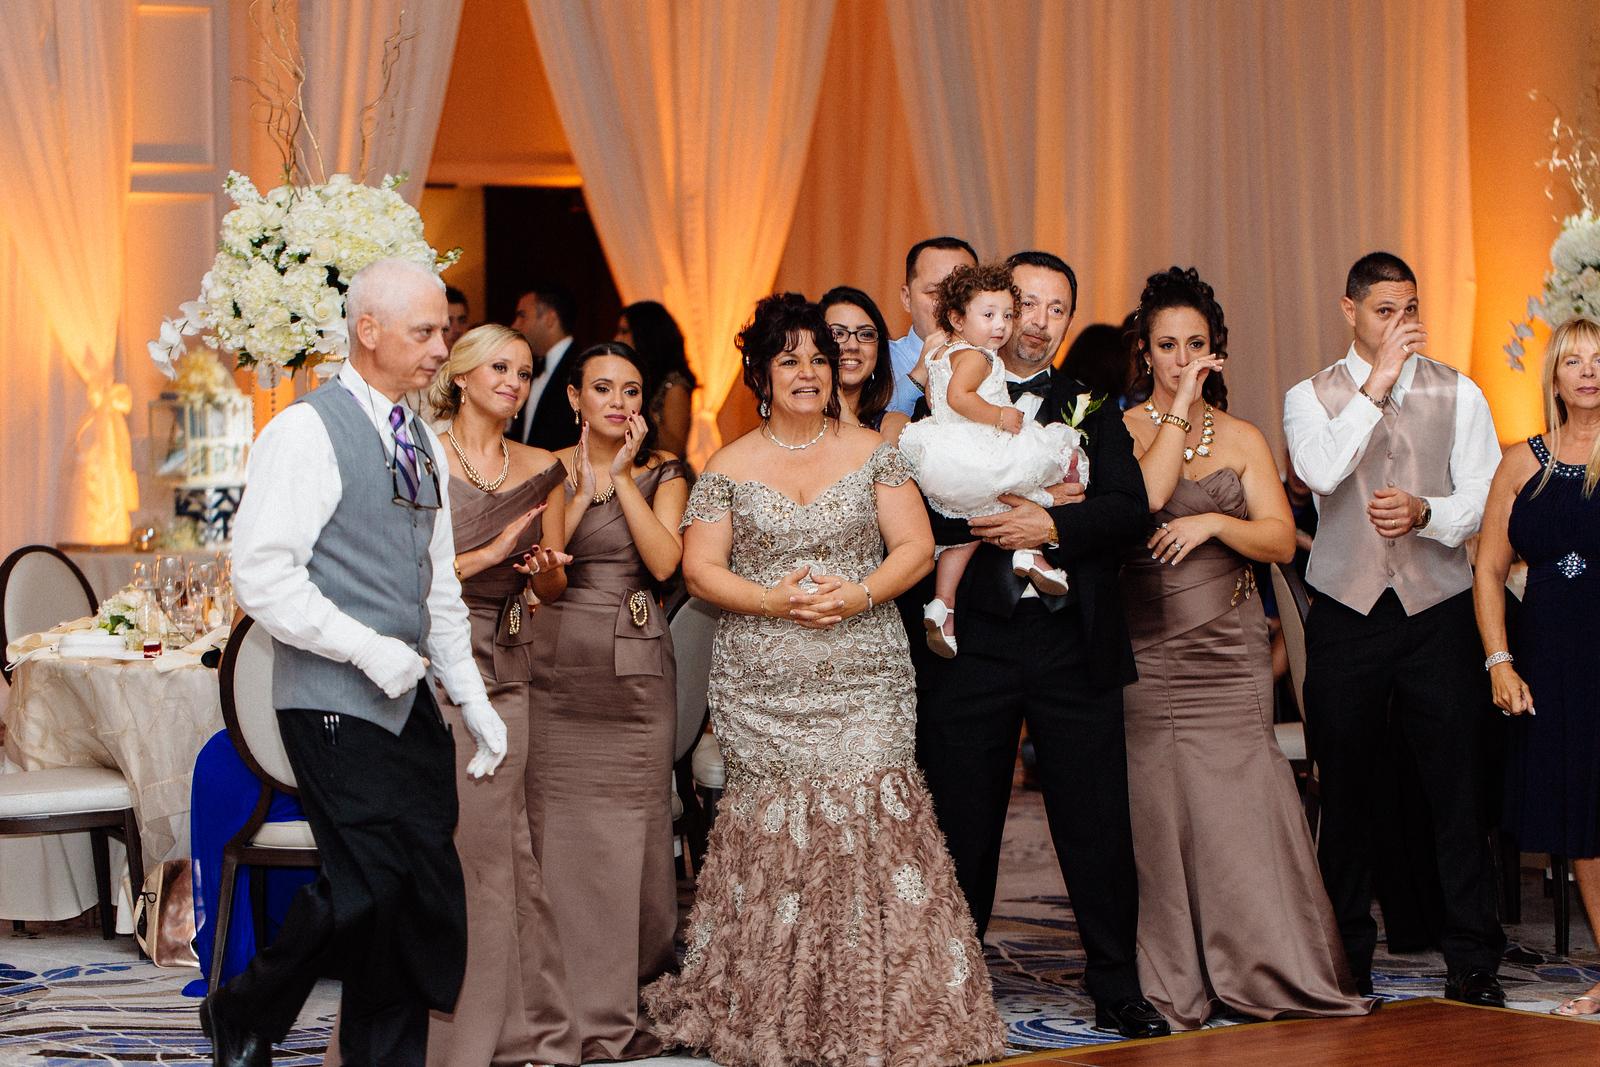 South-Florida-Wedding-Photographer-Andreo-5D3_5412